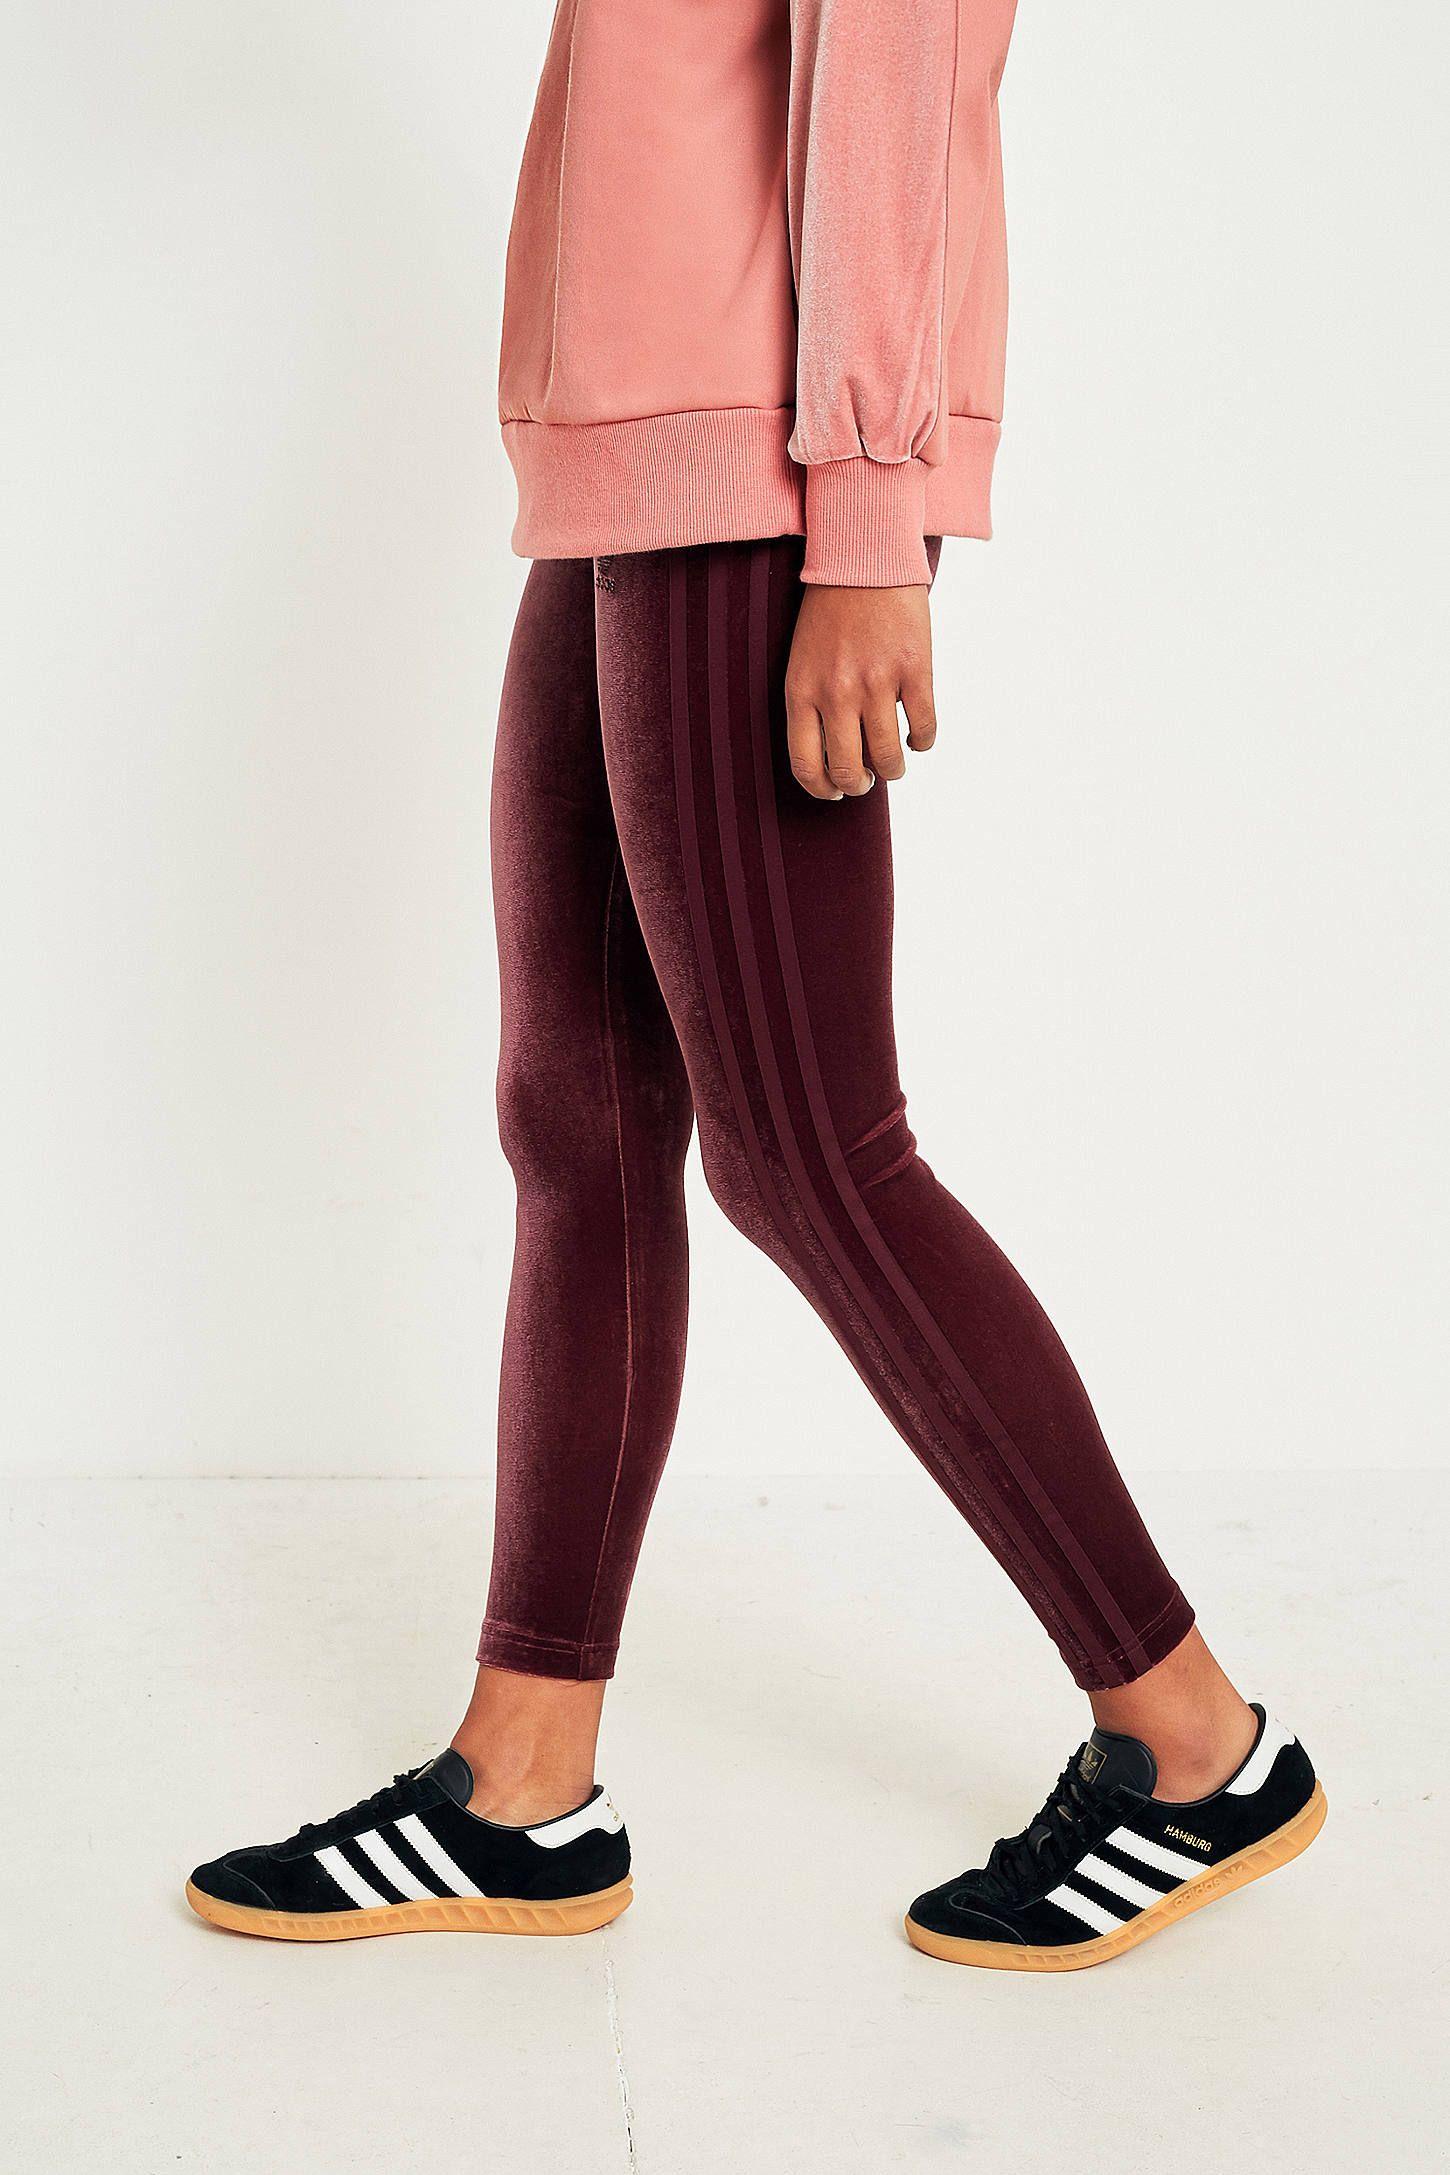 adidas Originals 3 Stripe Burgundy Velvet Legging | Fabulous